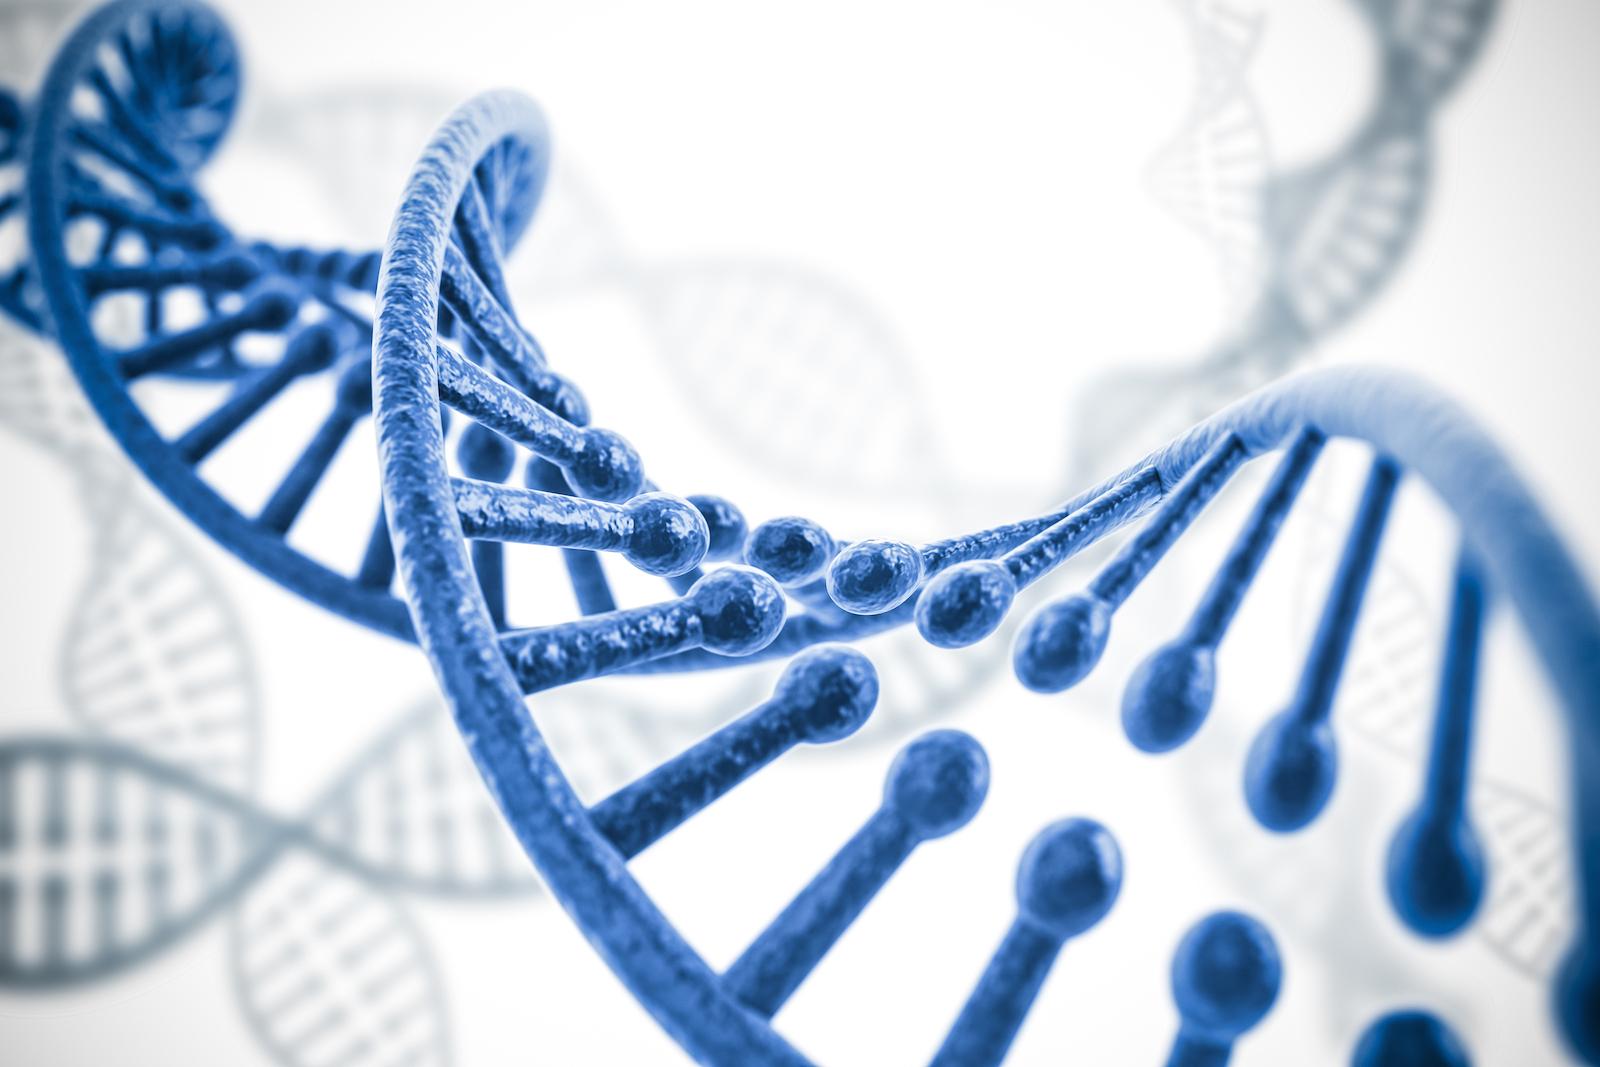 Asymmetrex To Present Advances in Stem Cell Medicine